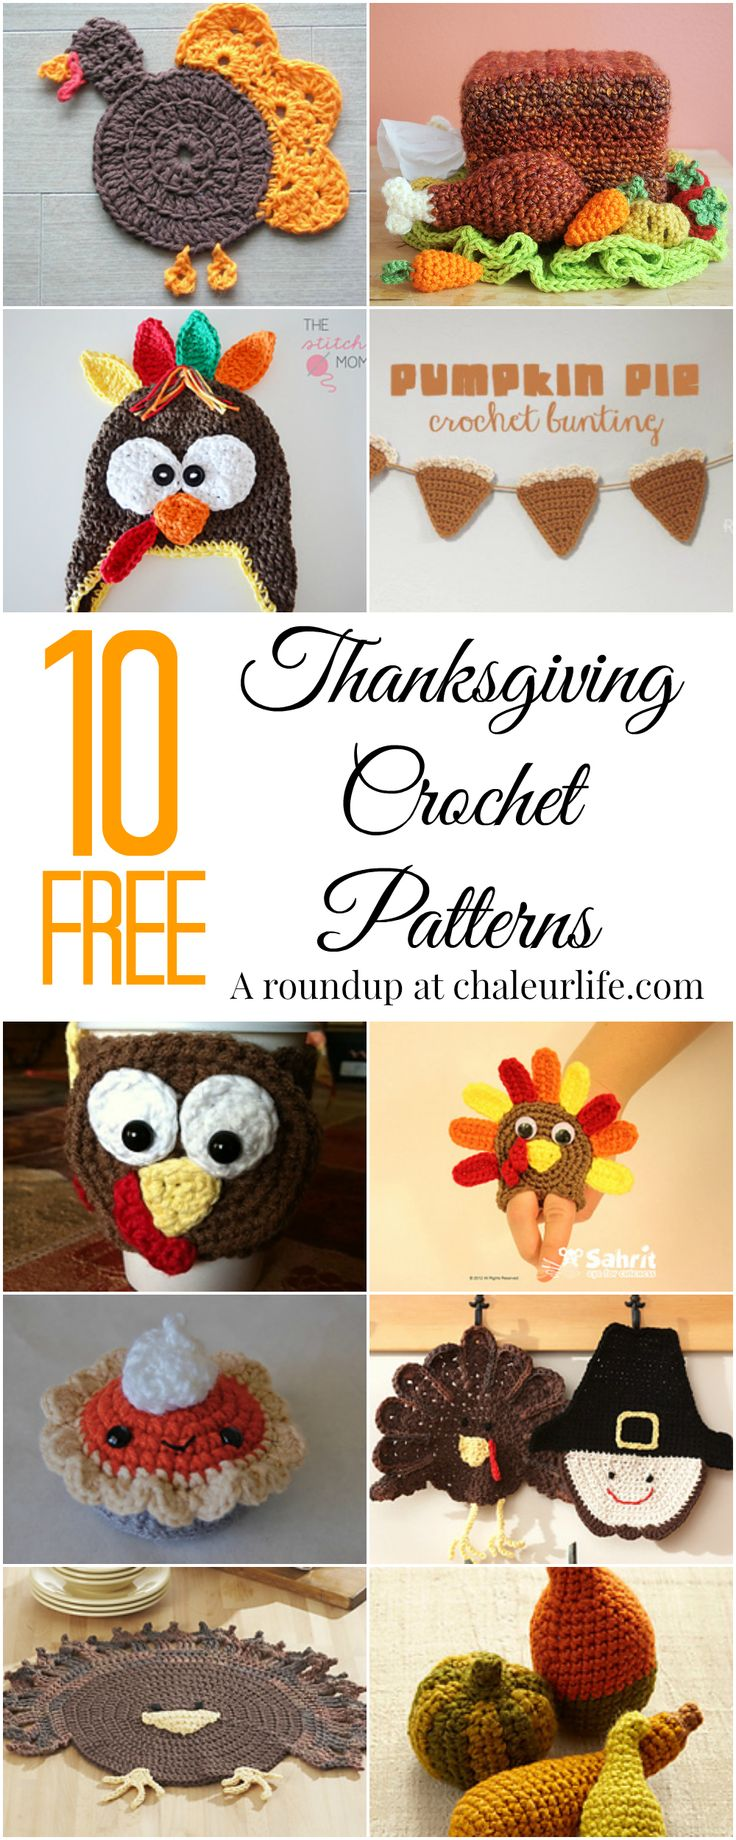 10 Free Thanksgiving Crochet Patterns